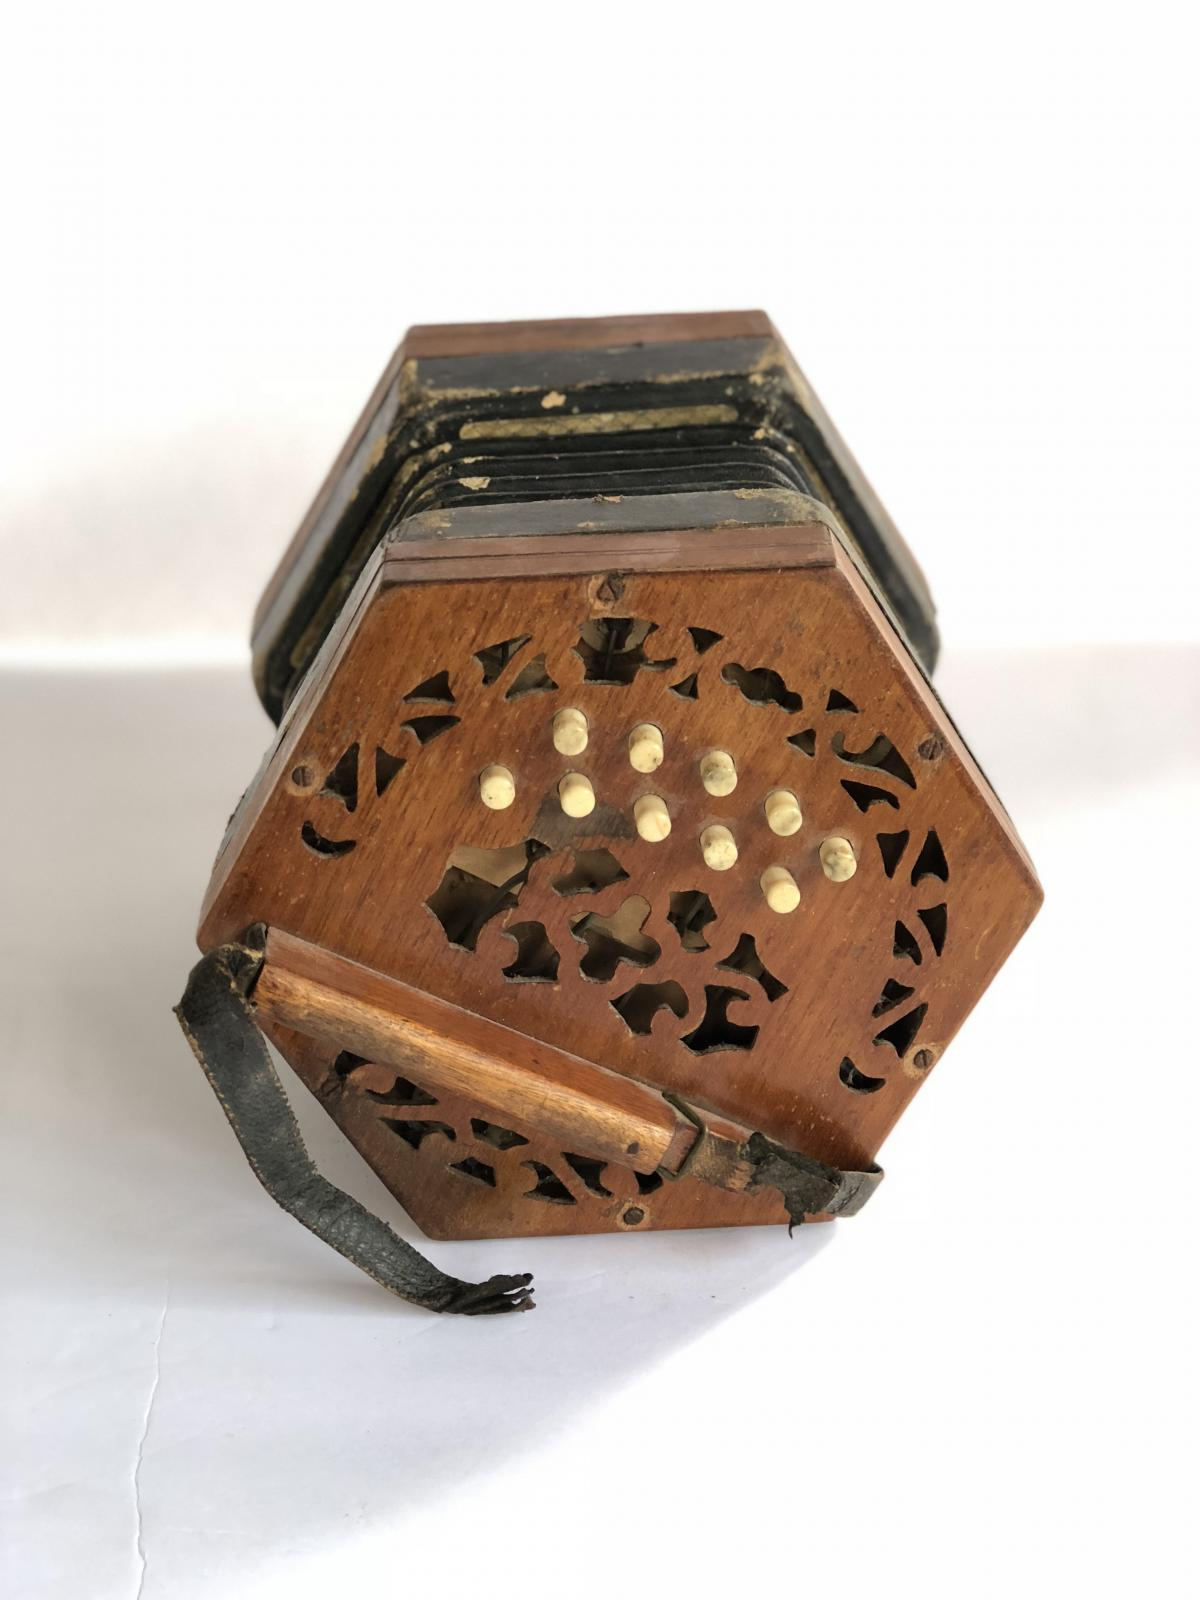 Dating concertinas